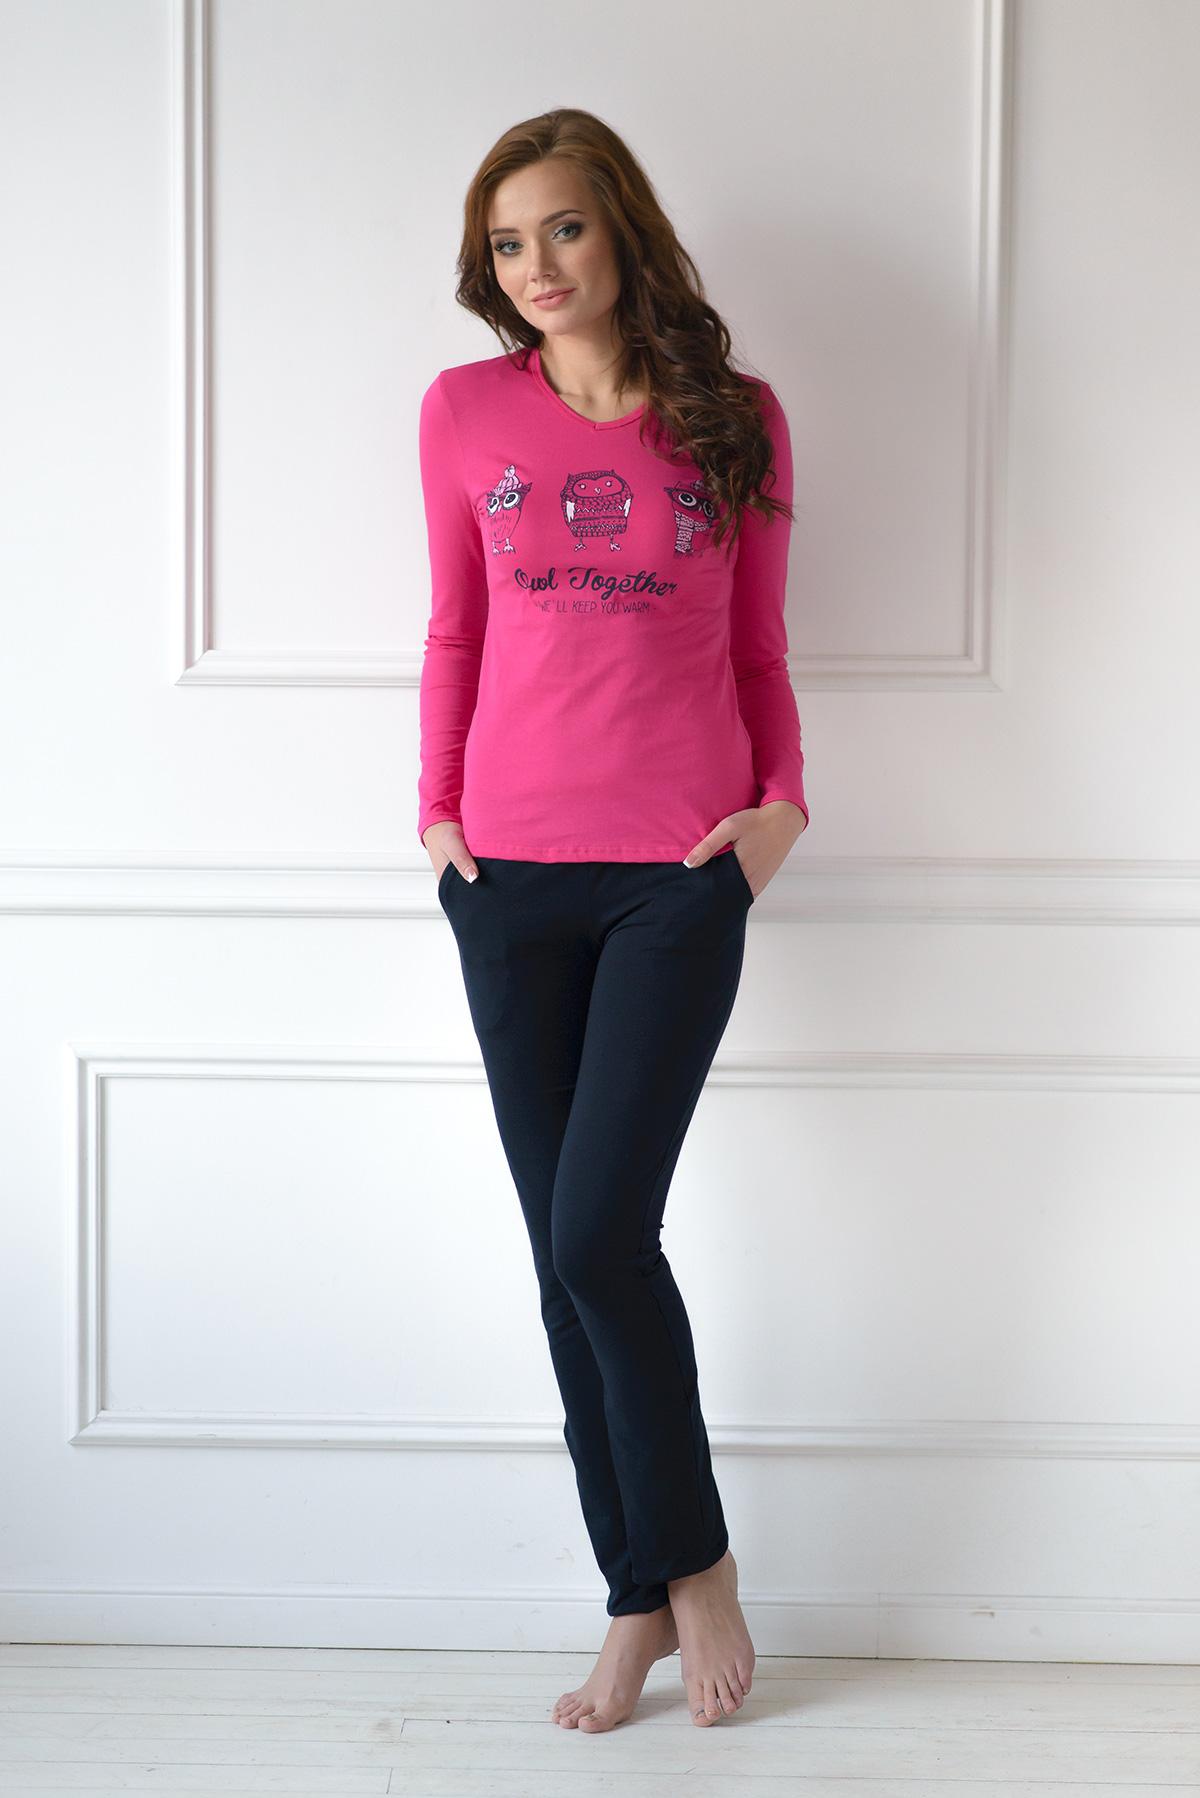 Жен. костюм арт. 19-0125 Малиновый р. 44Костюмы<br><br><br>Тип: Жен. костюм<br>Размер: 44<br>Материал: Трикотаж